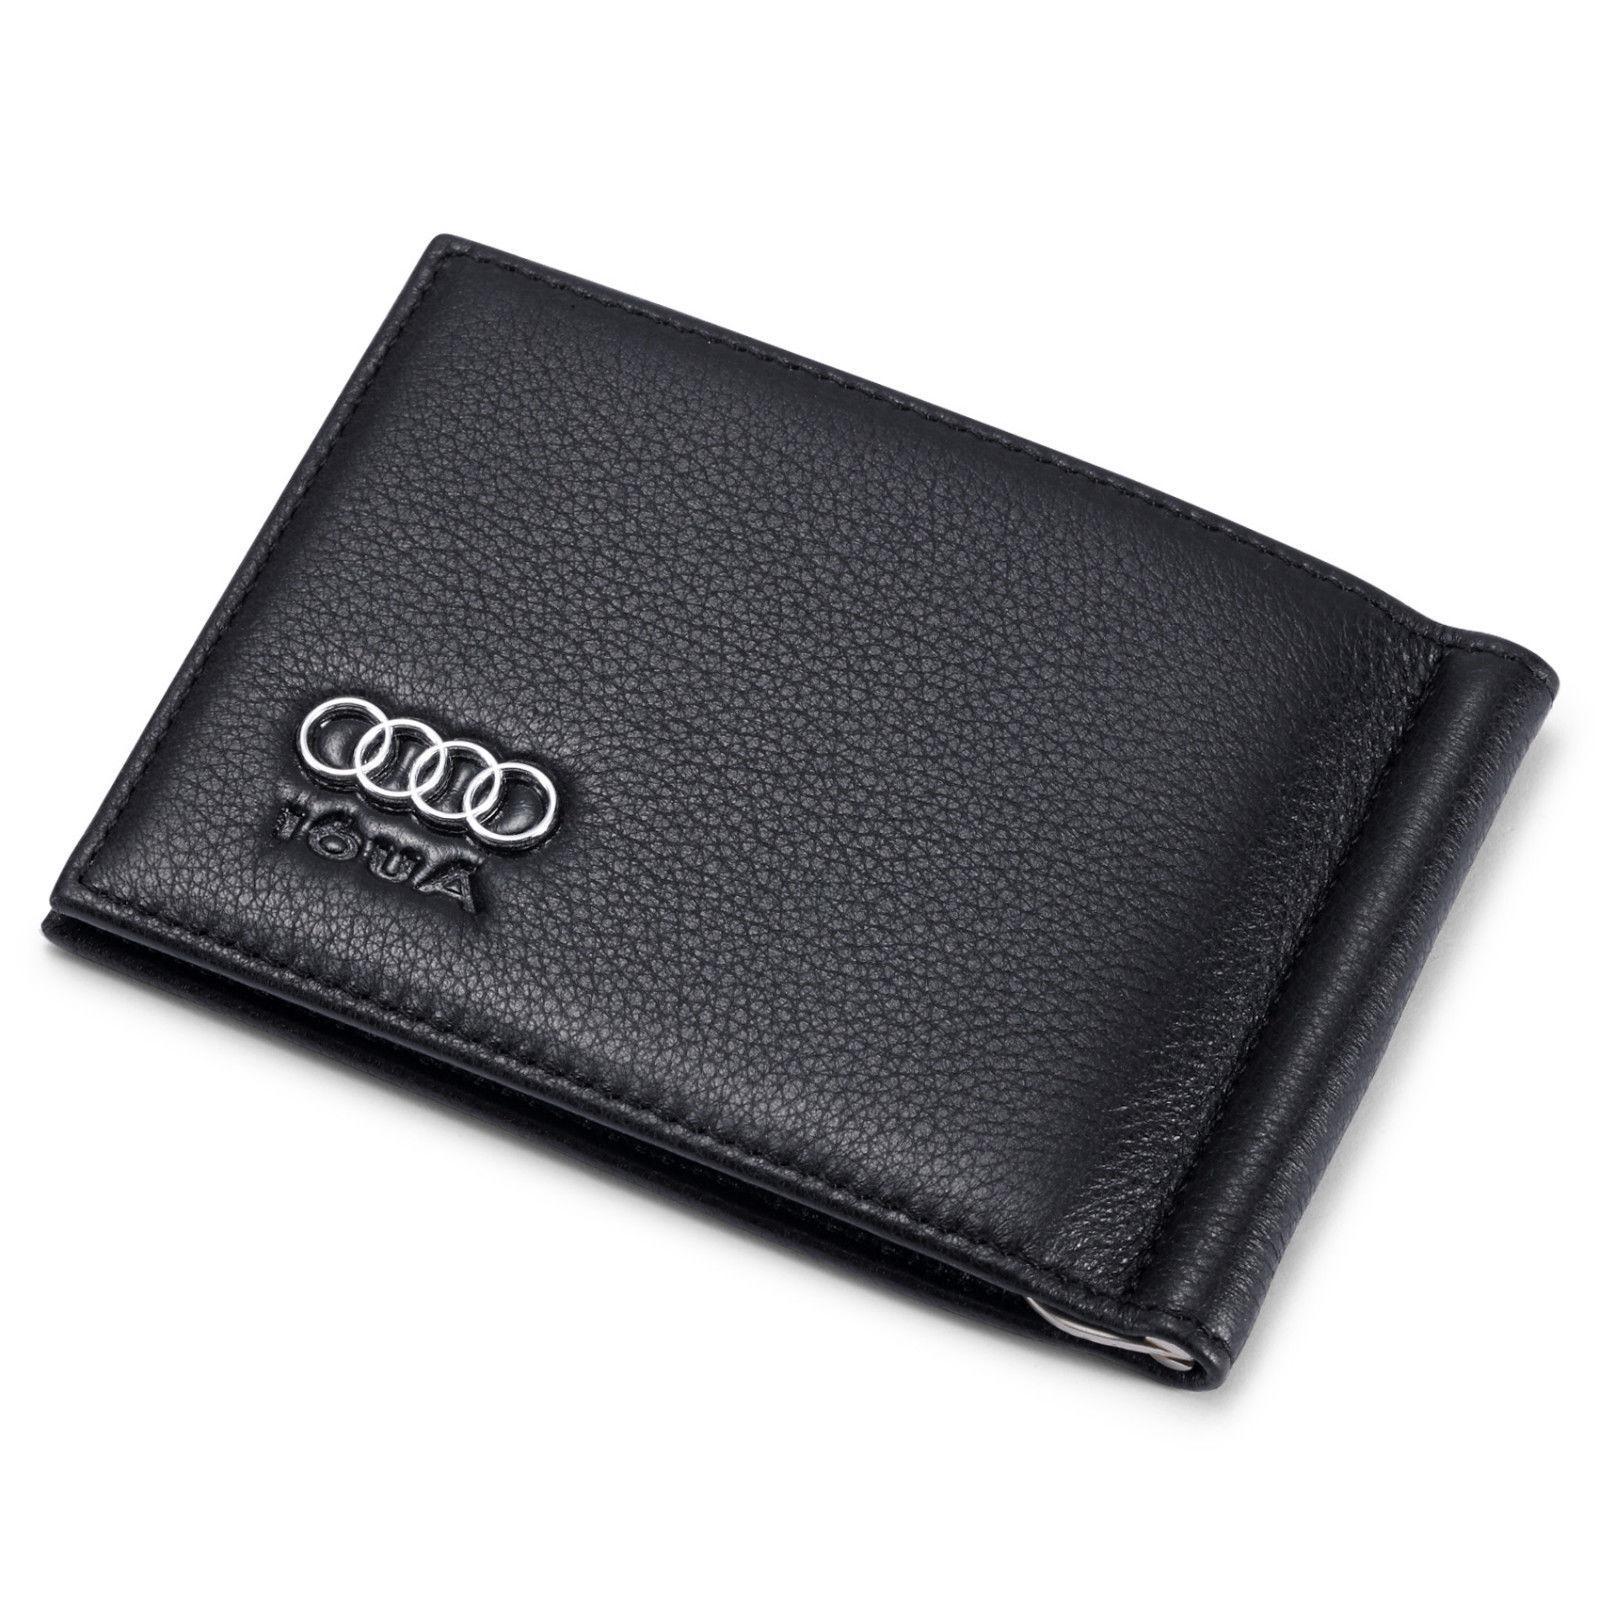 Audi Men Money Clip Wallet Black Genuine Leather 6 Credit Ca